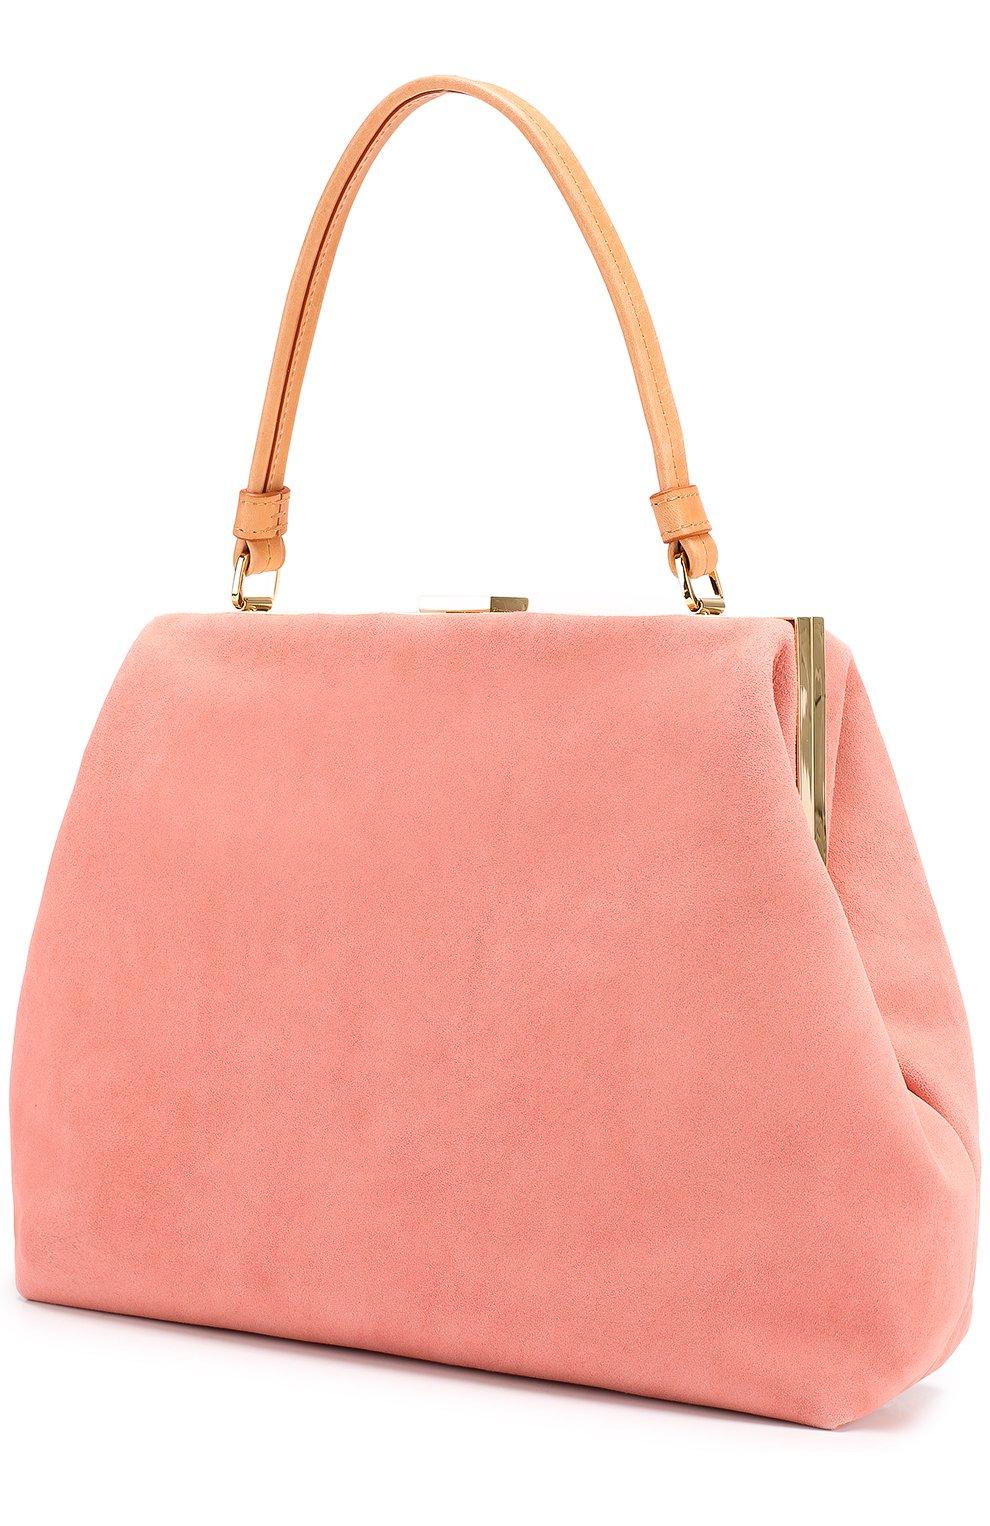 337905311b06 Женская замшевая сумка elegant MANSUR GAVRIEL розового цвета ...